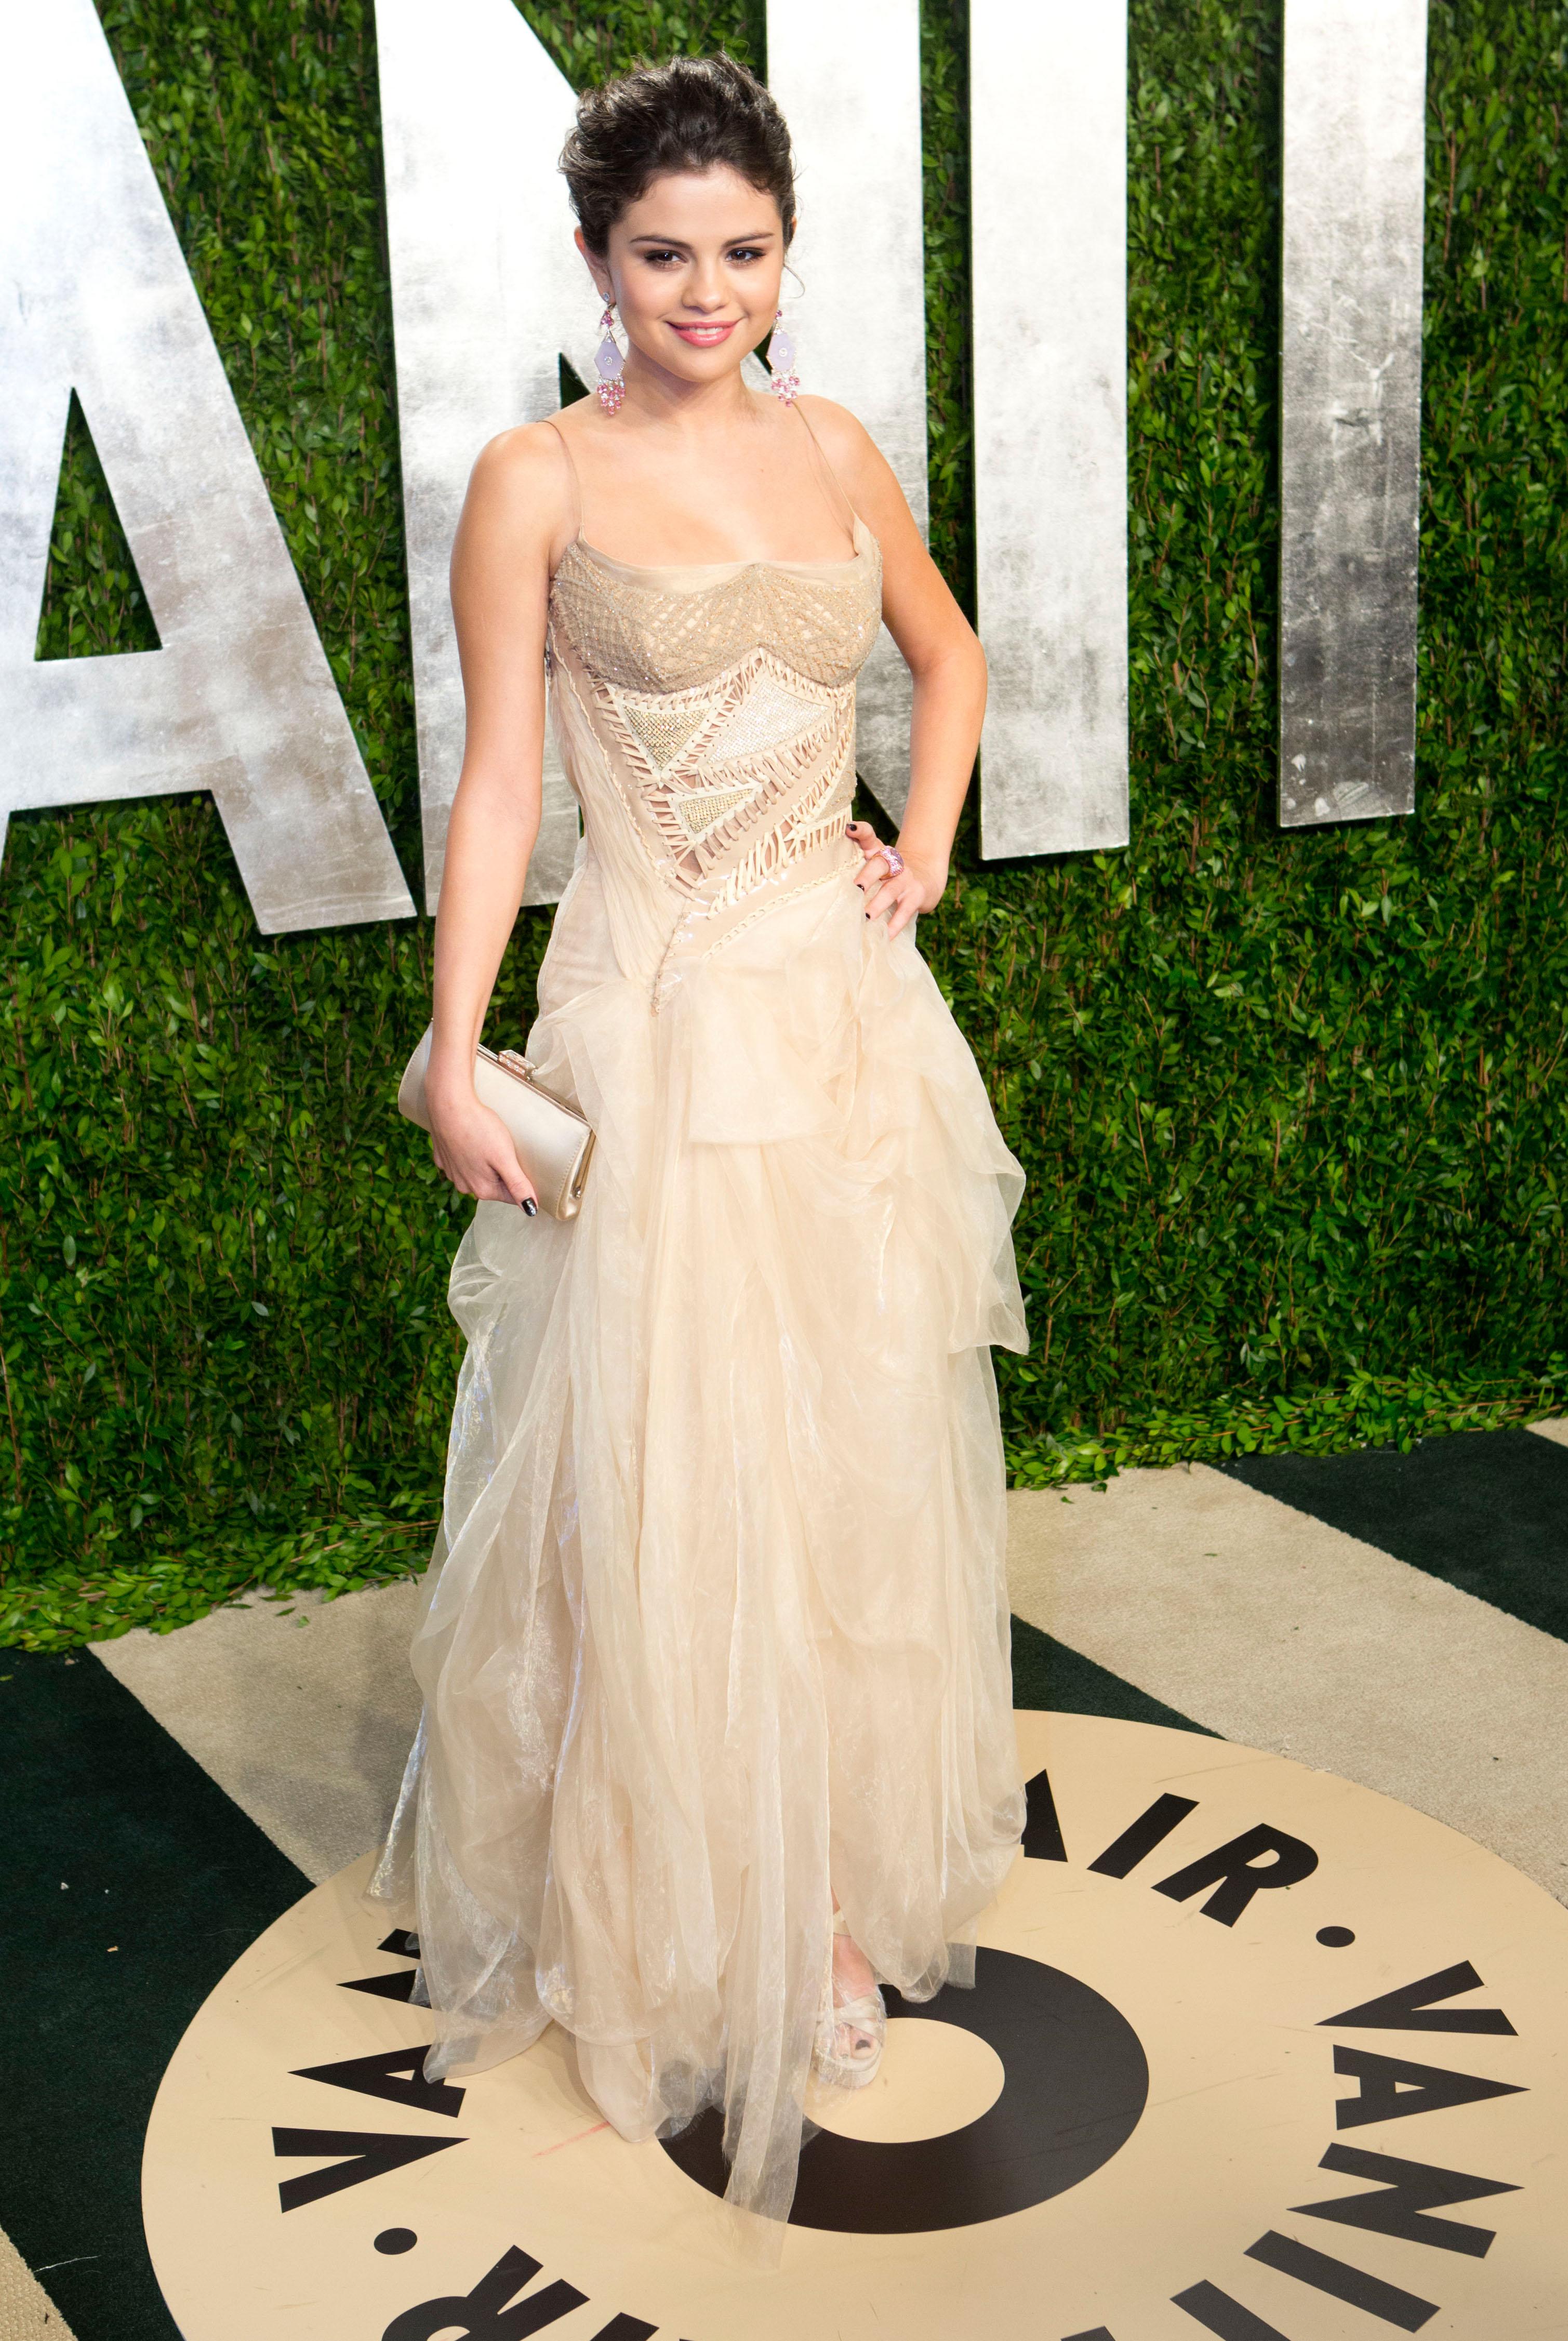 Selena Gomez arrived at the Vanity Fair Oscar party.